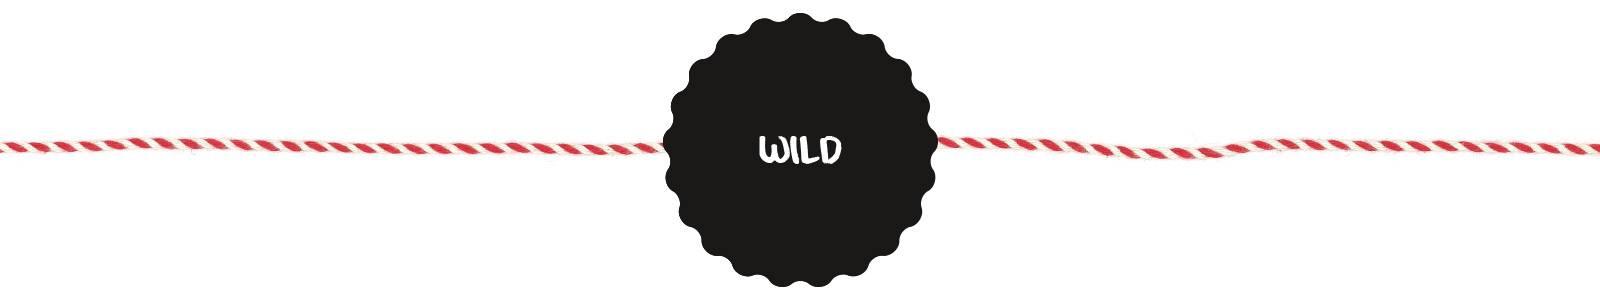 Vleesch&co Categorie Wild gevogelte